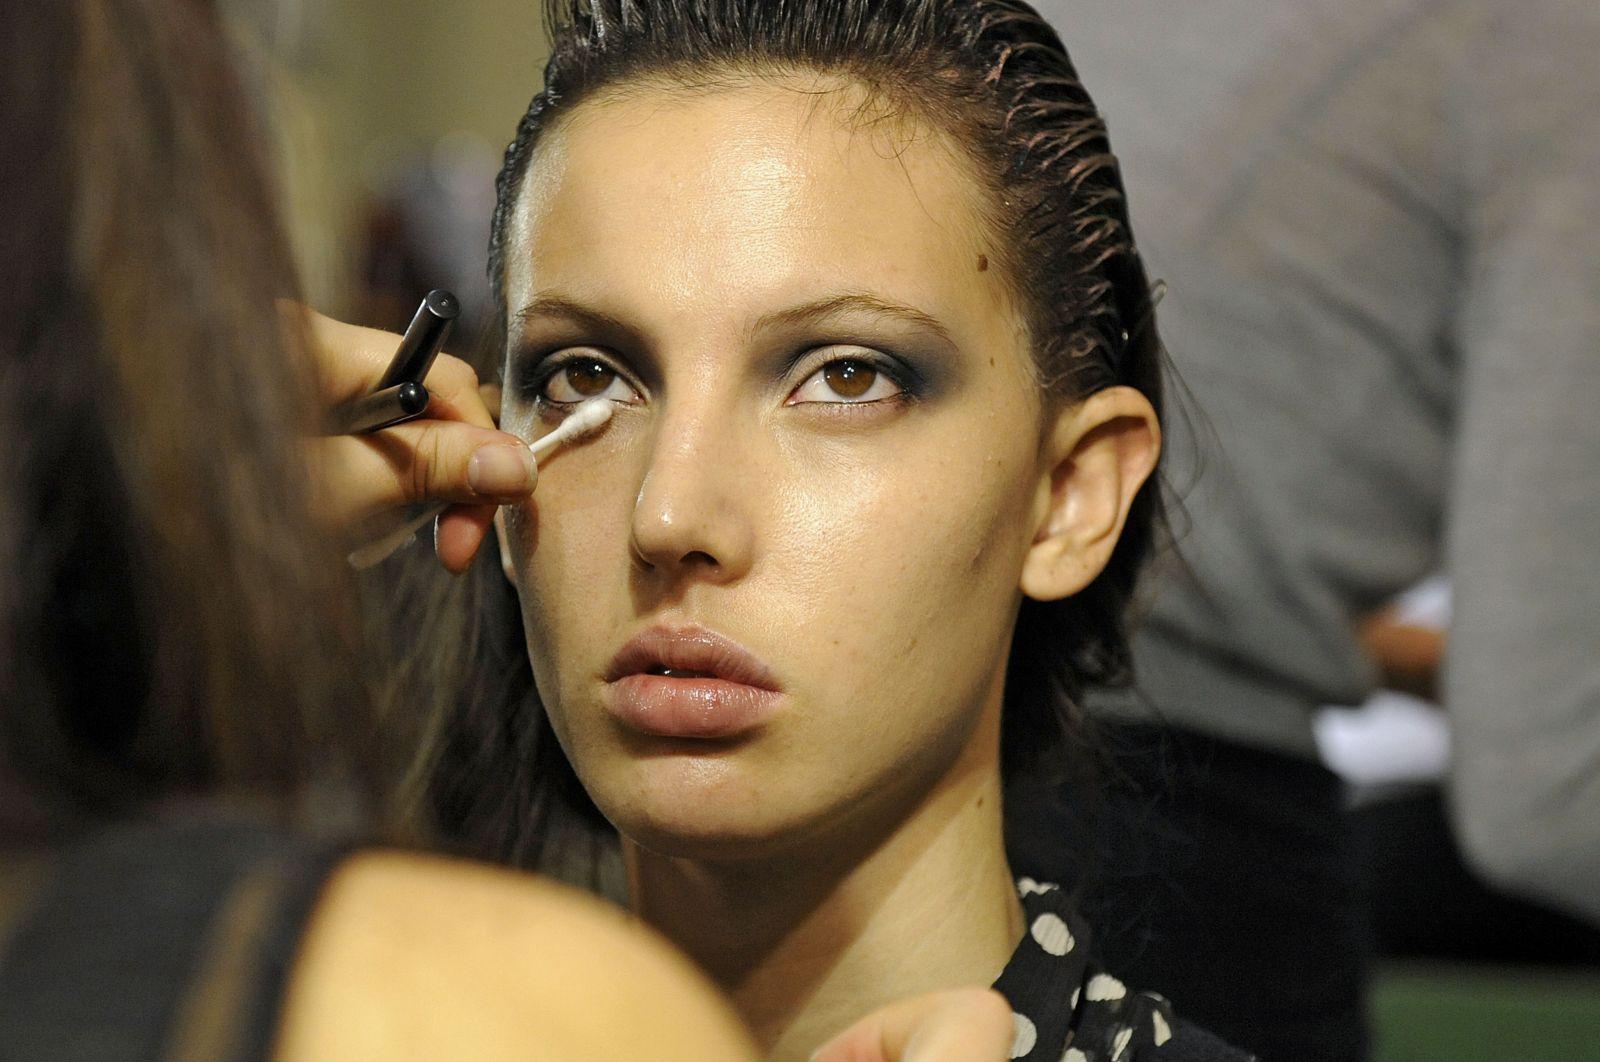 макияж с серыми тенями